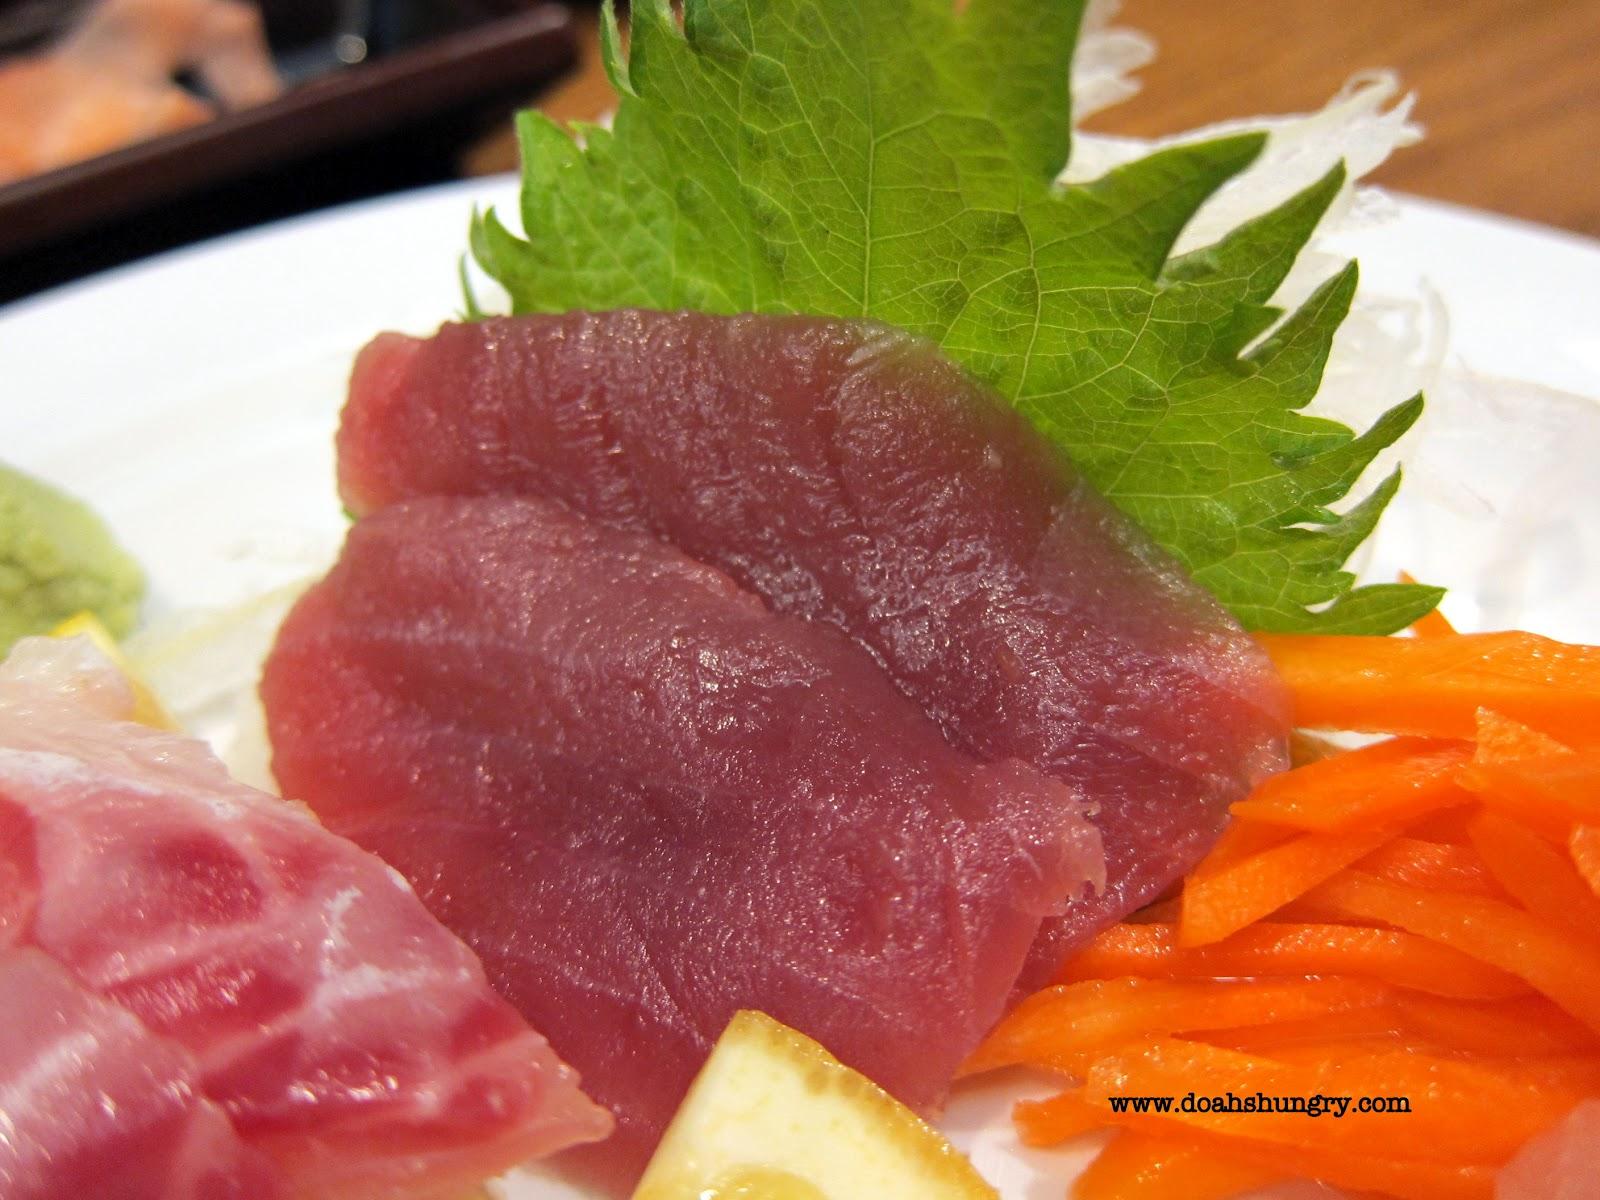 Doah's Hungry: Sushi Stop